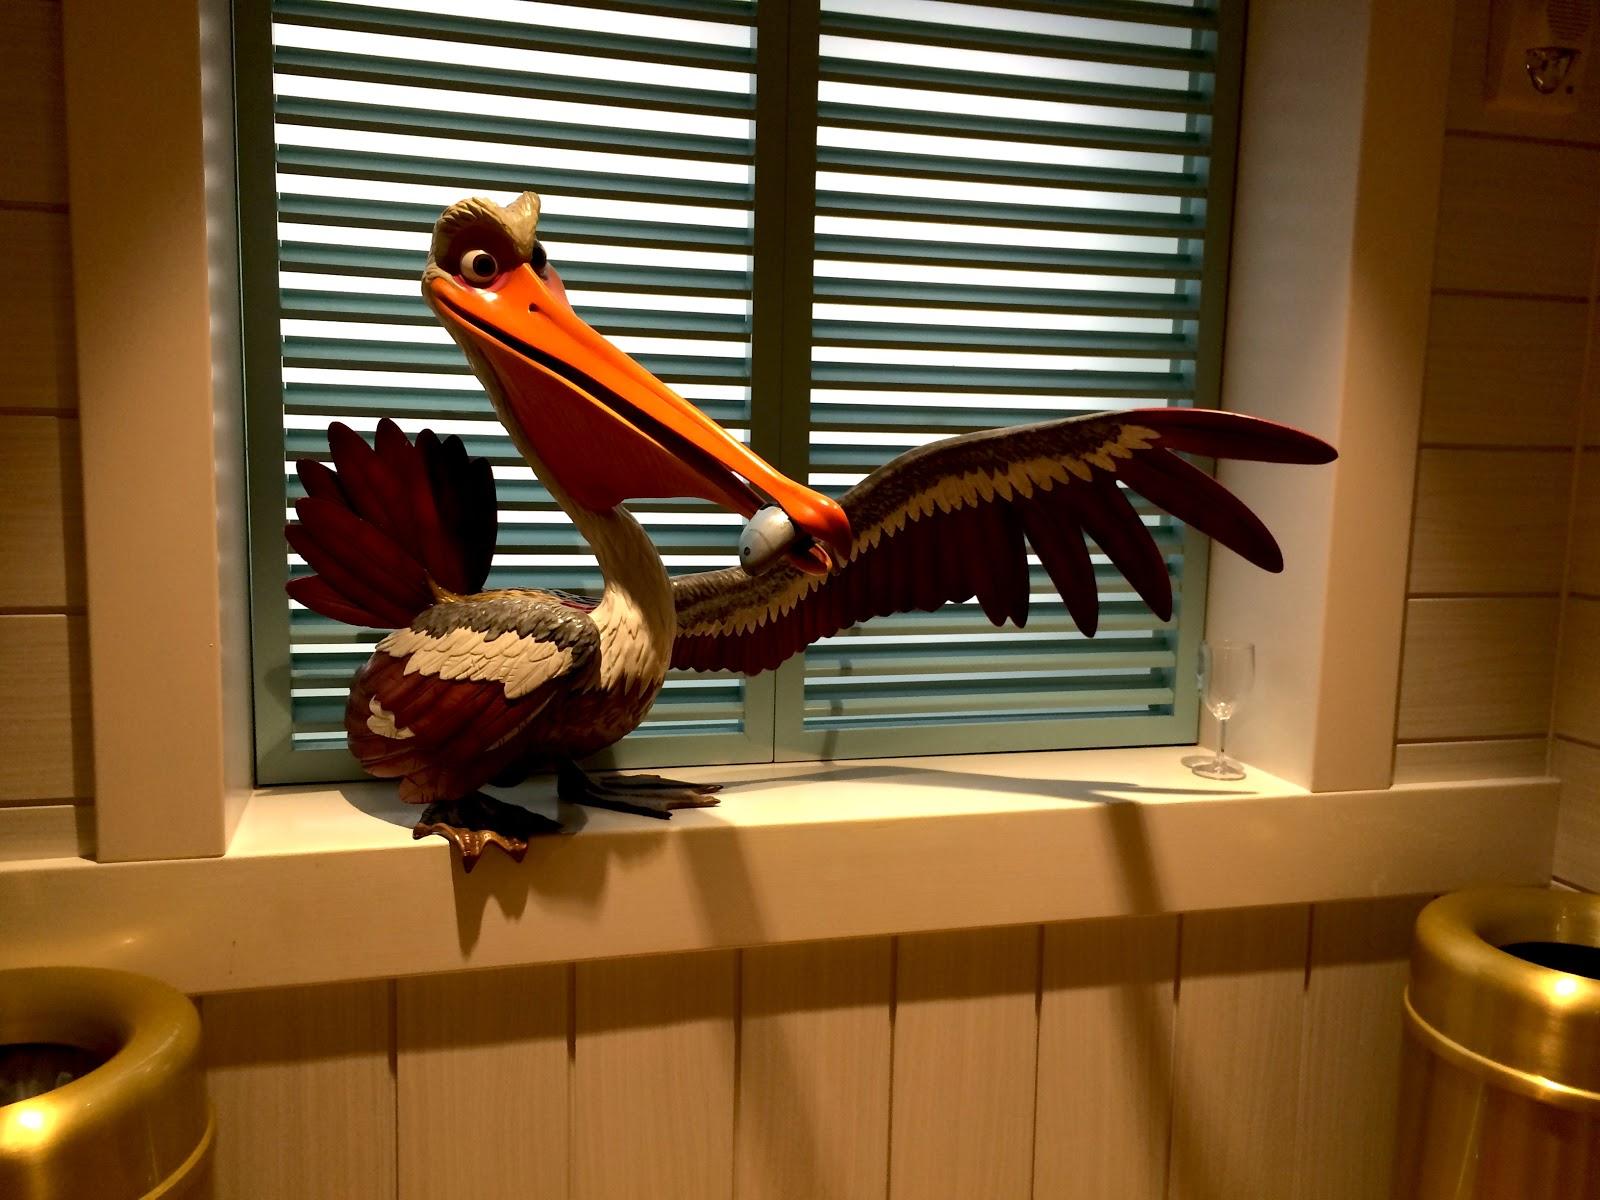 Nigel Finding Nemo Flying